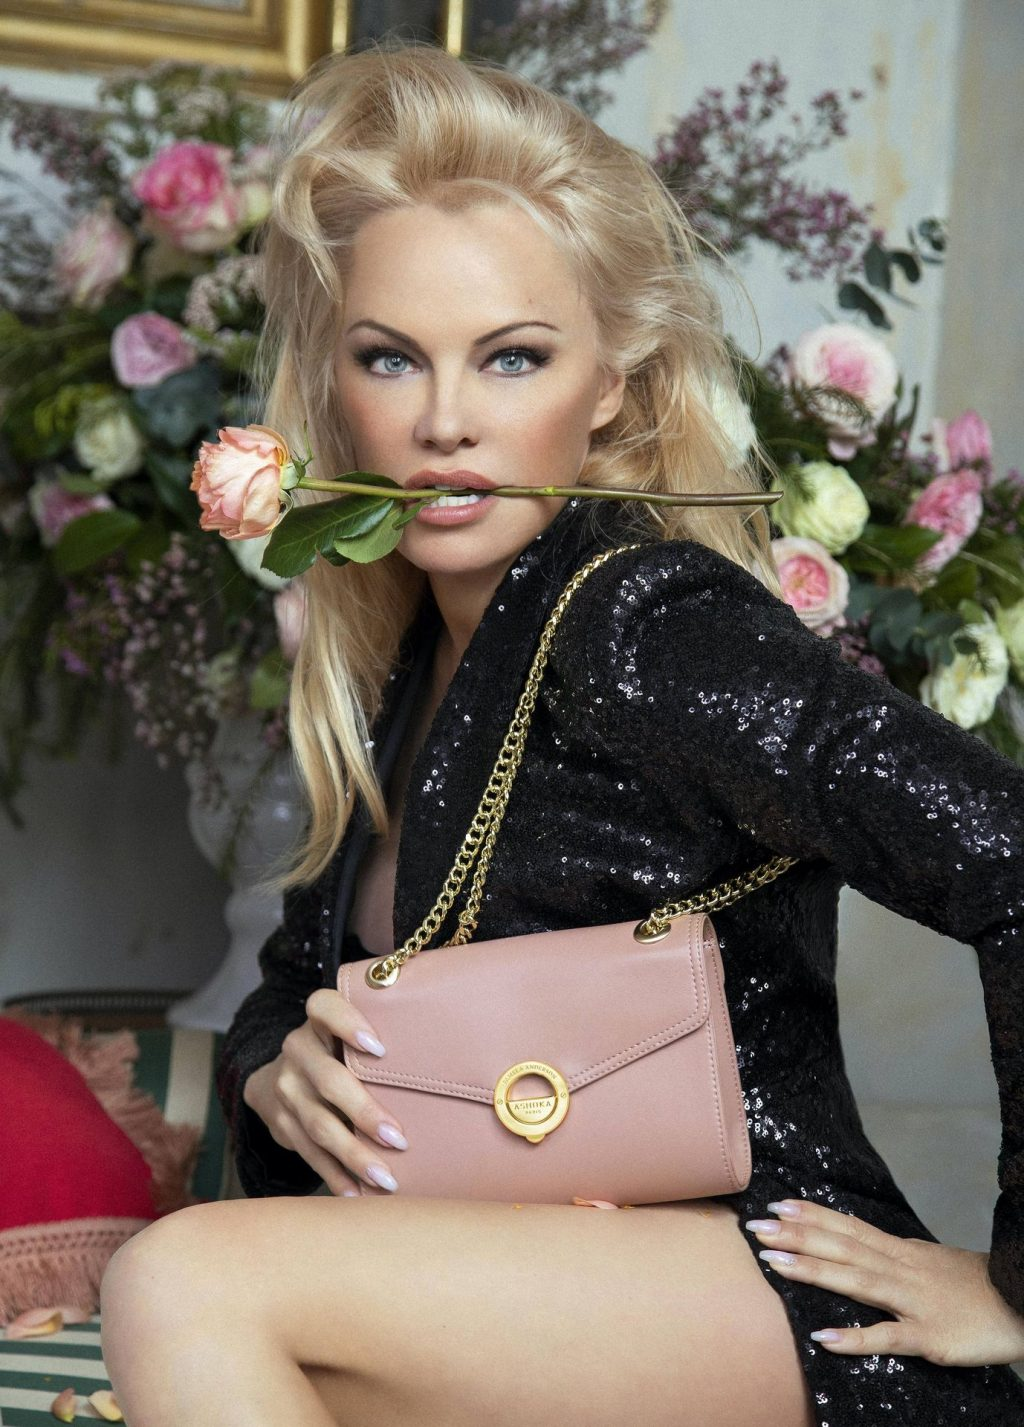 Pamela Anderson Looks Stunning in Vegan Bag Campaign (8 Photos)